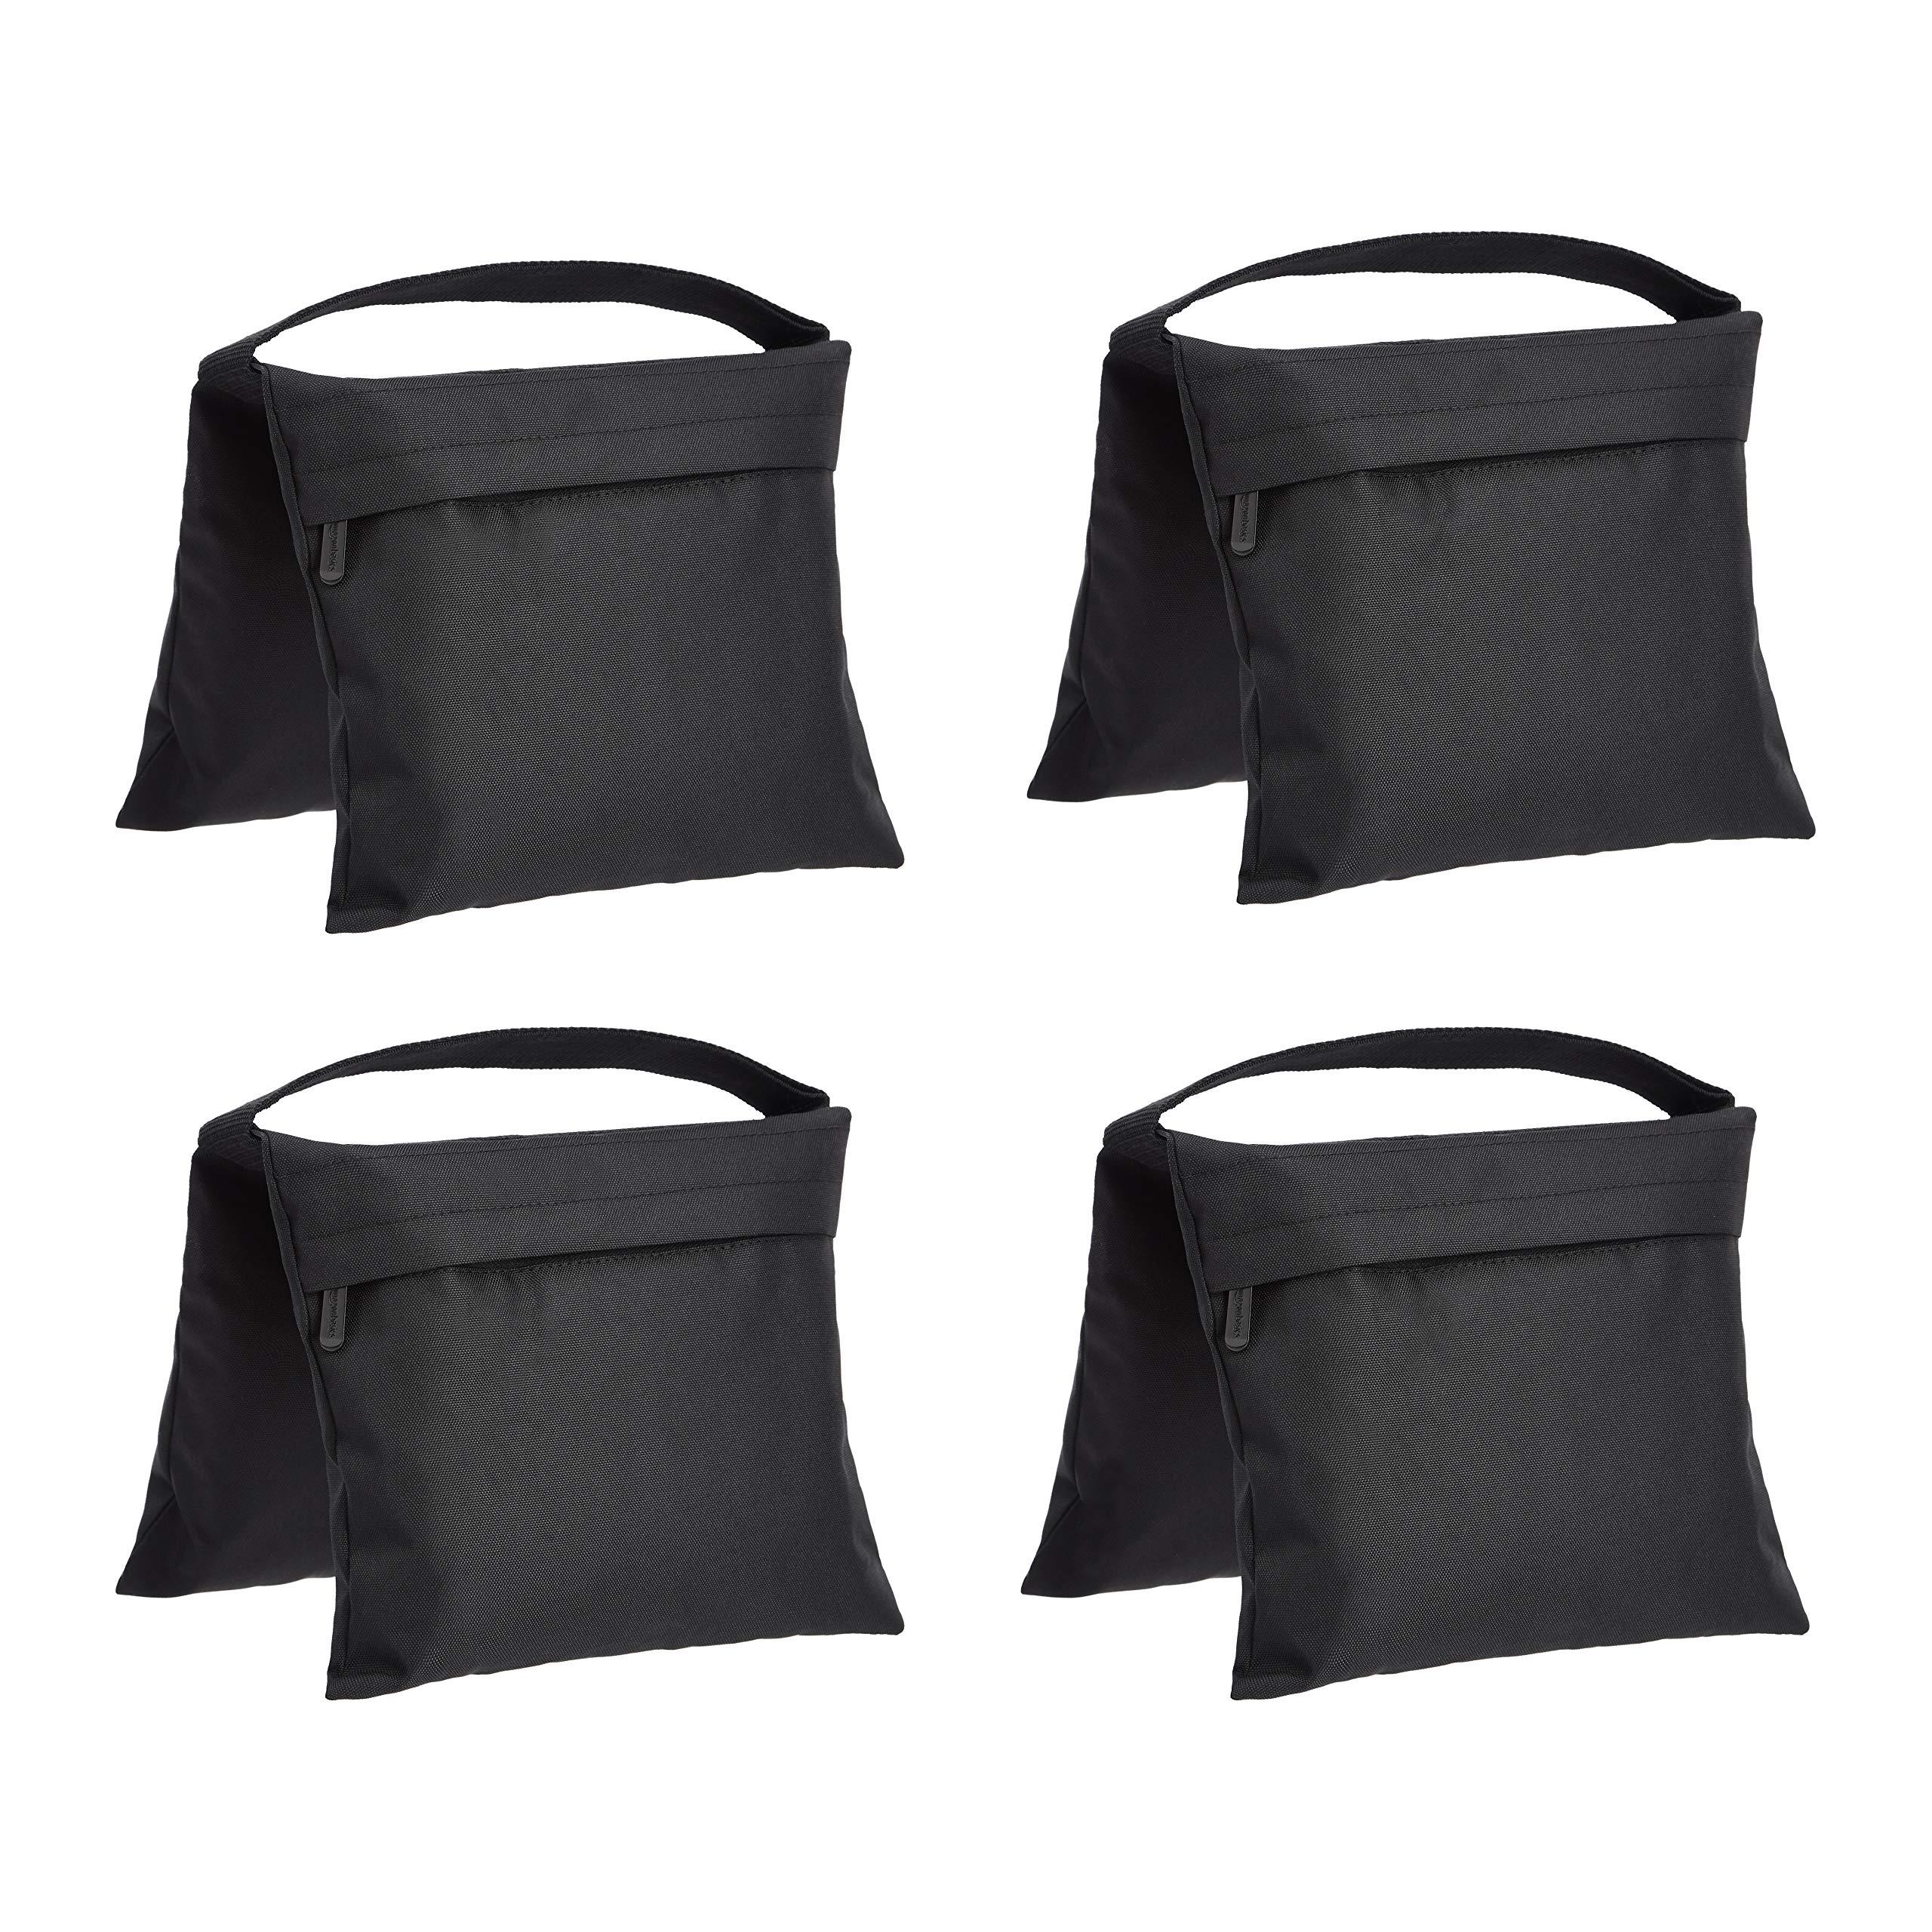 AmazonBasics Photographic Empty Sandbag for Light Stands, 4 Pack by AmazonBasics